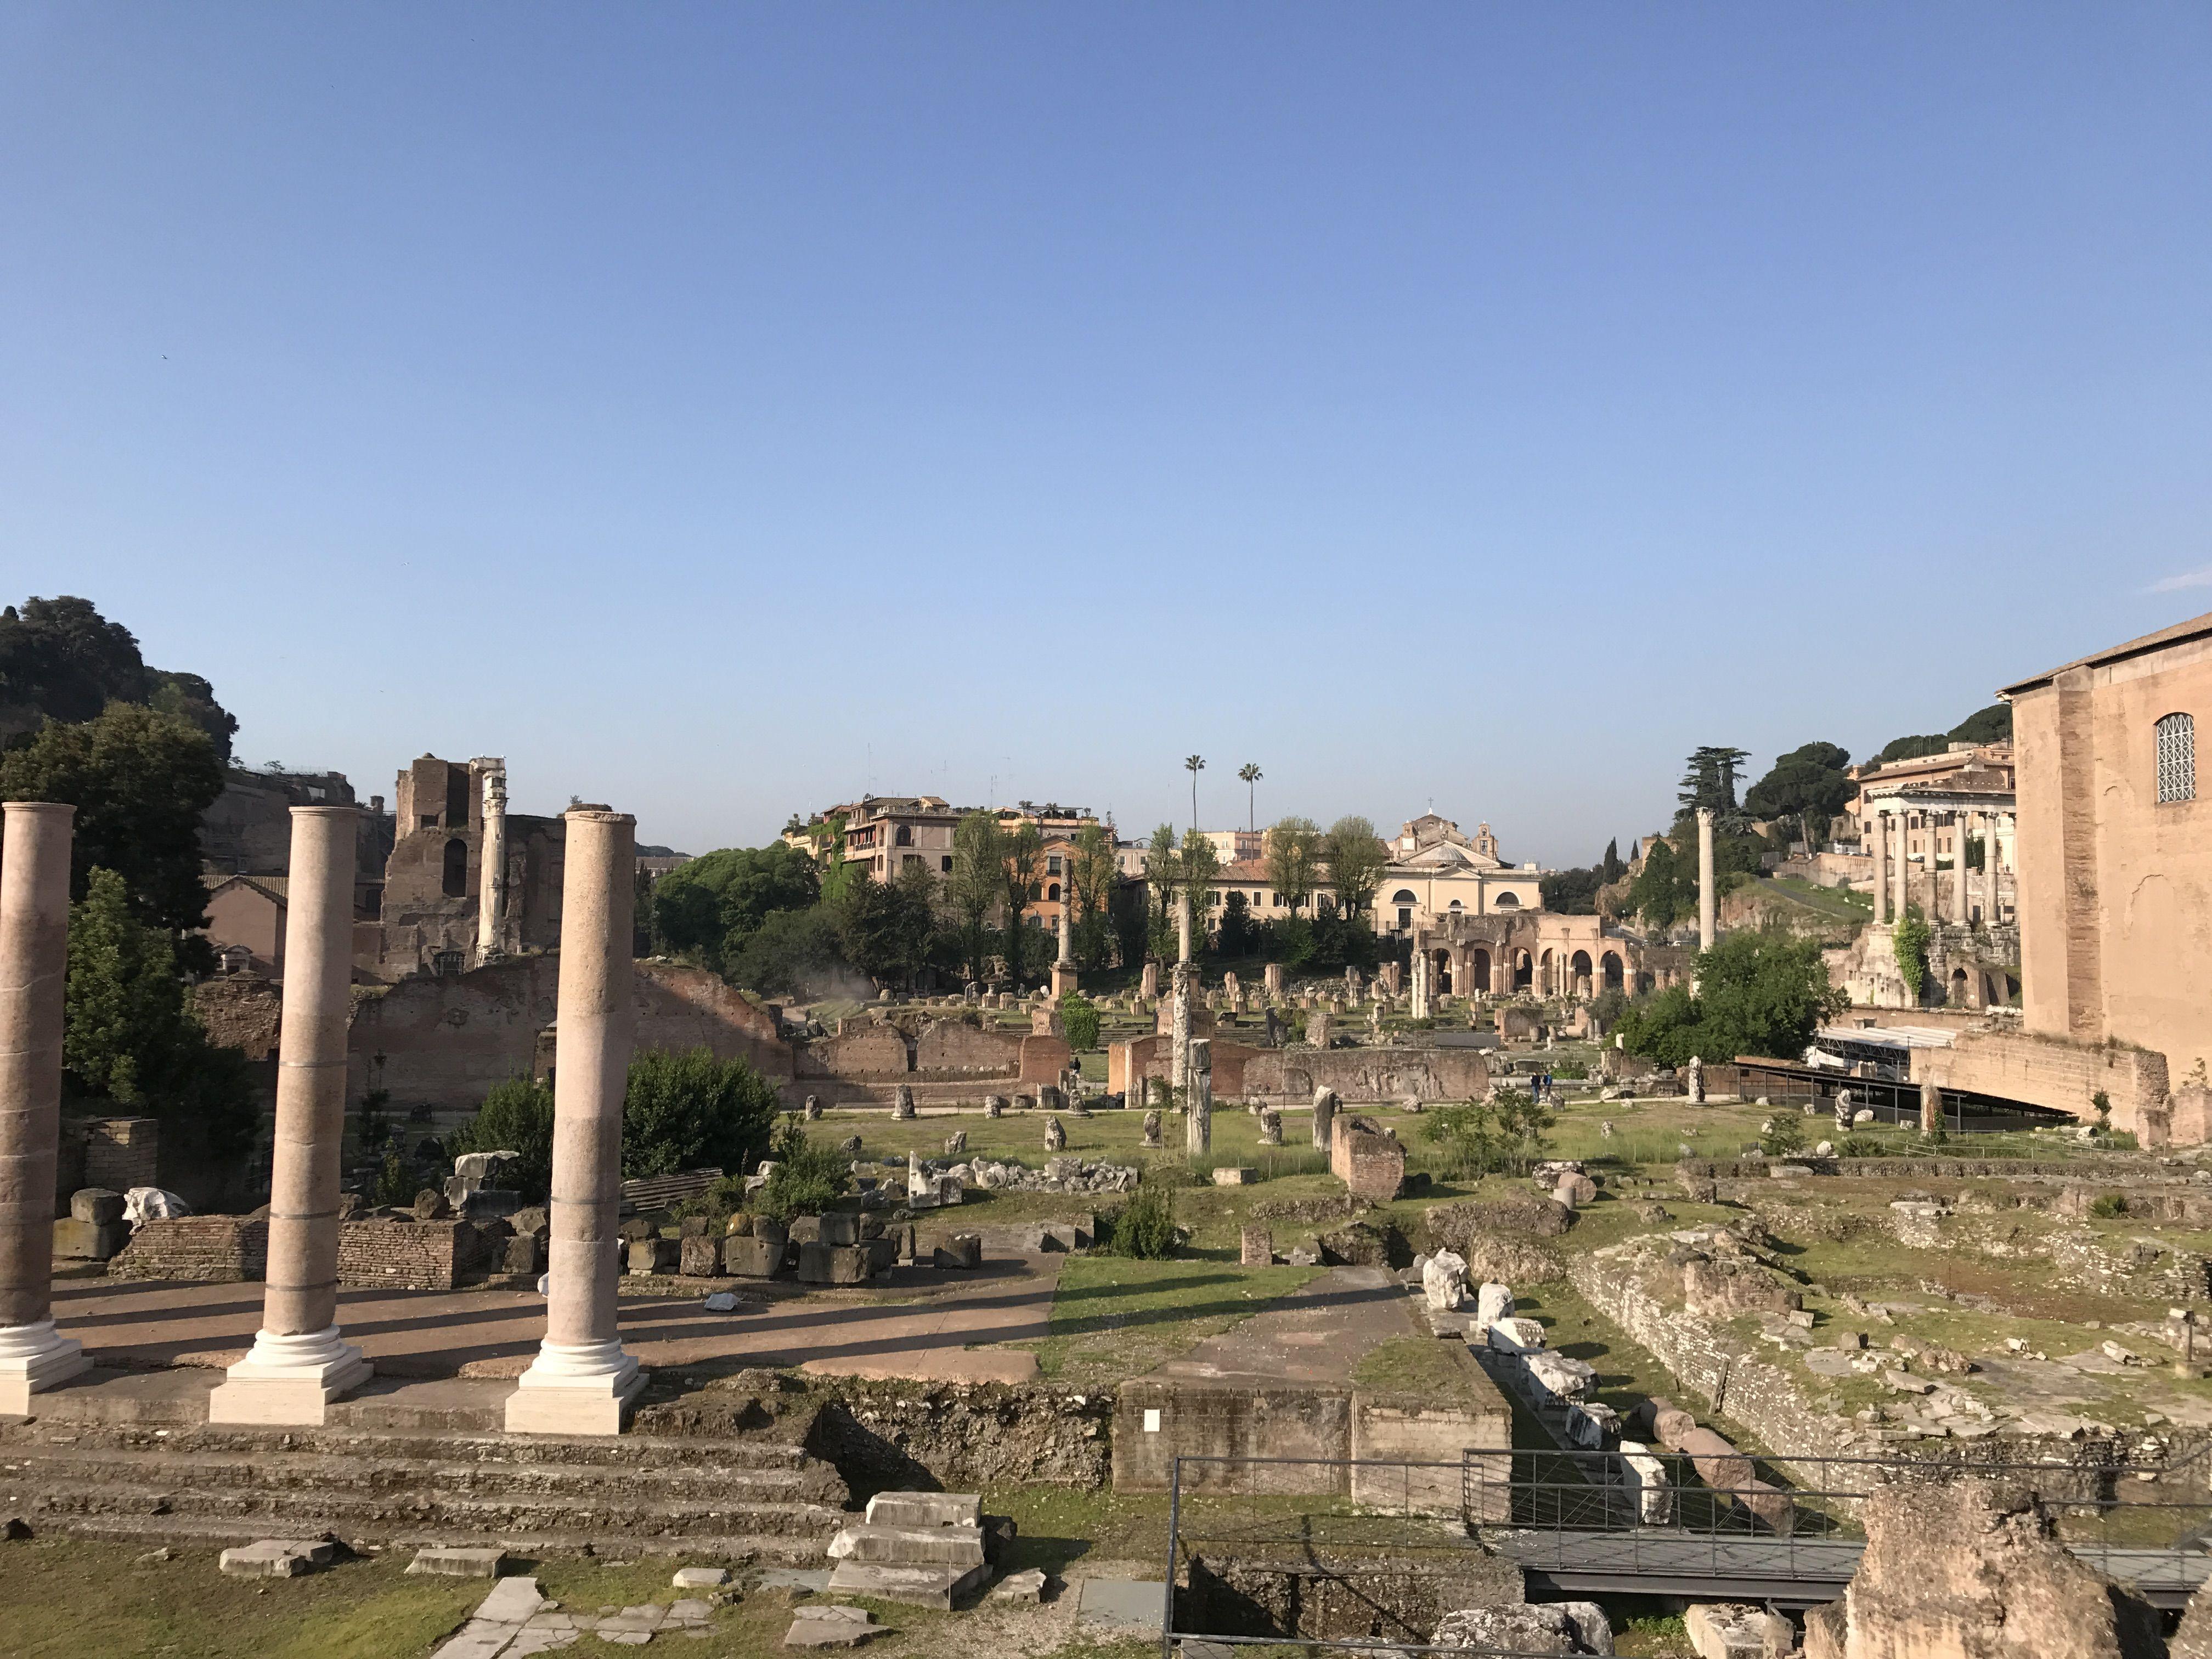 An ordinary morning in Rome...#treasurerome #betreasure